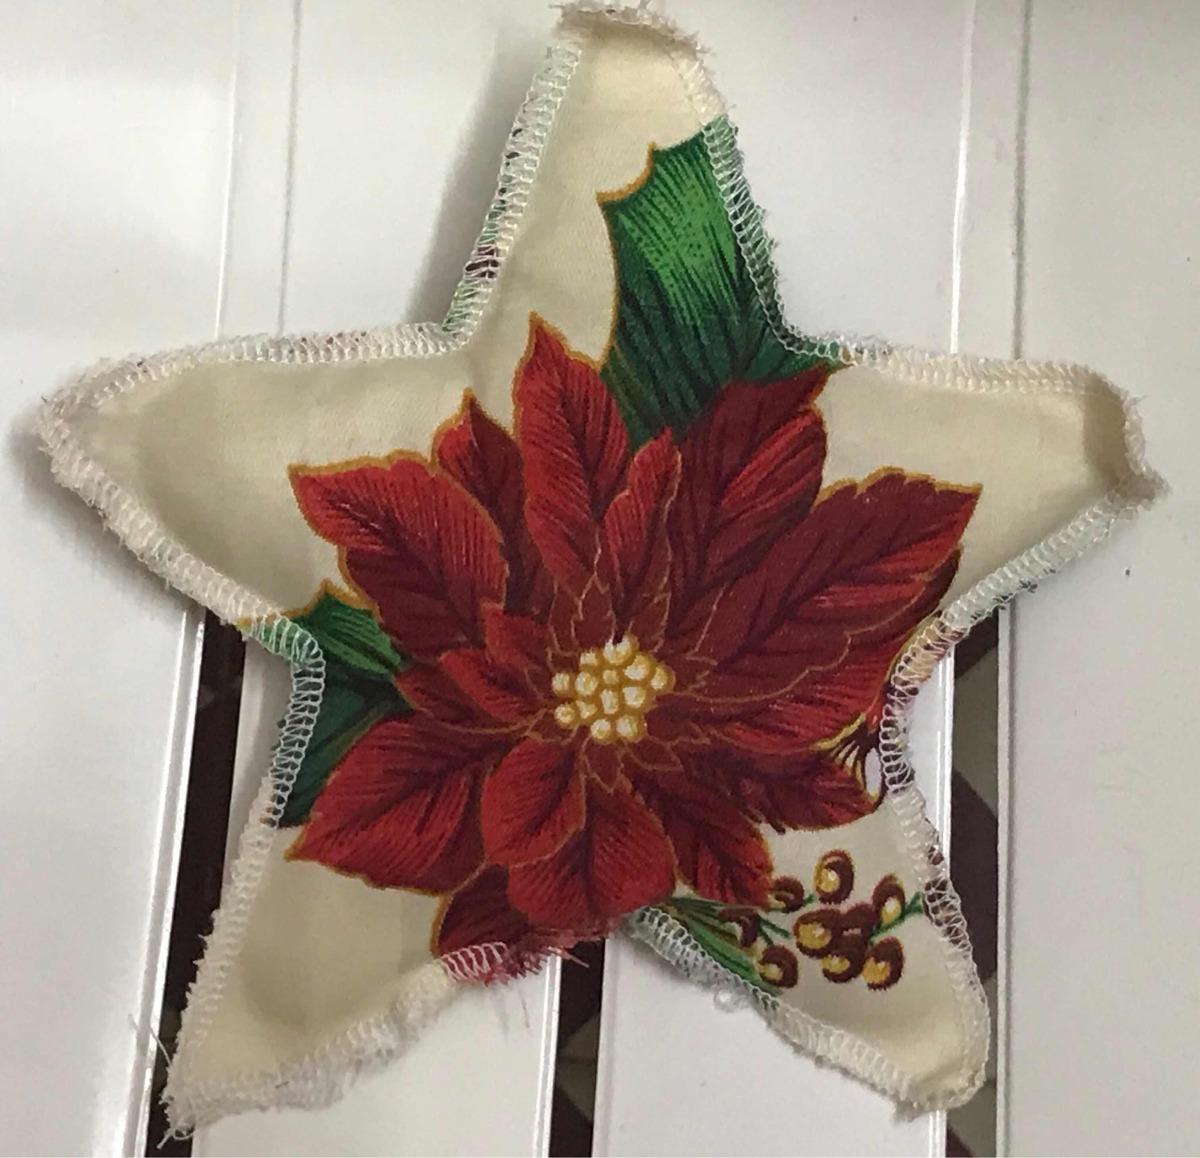 Adornos Para Arbol De Navidad Botas 35000 En Mercado Libre - Adornos-para-botas